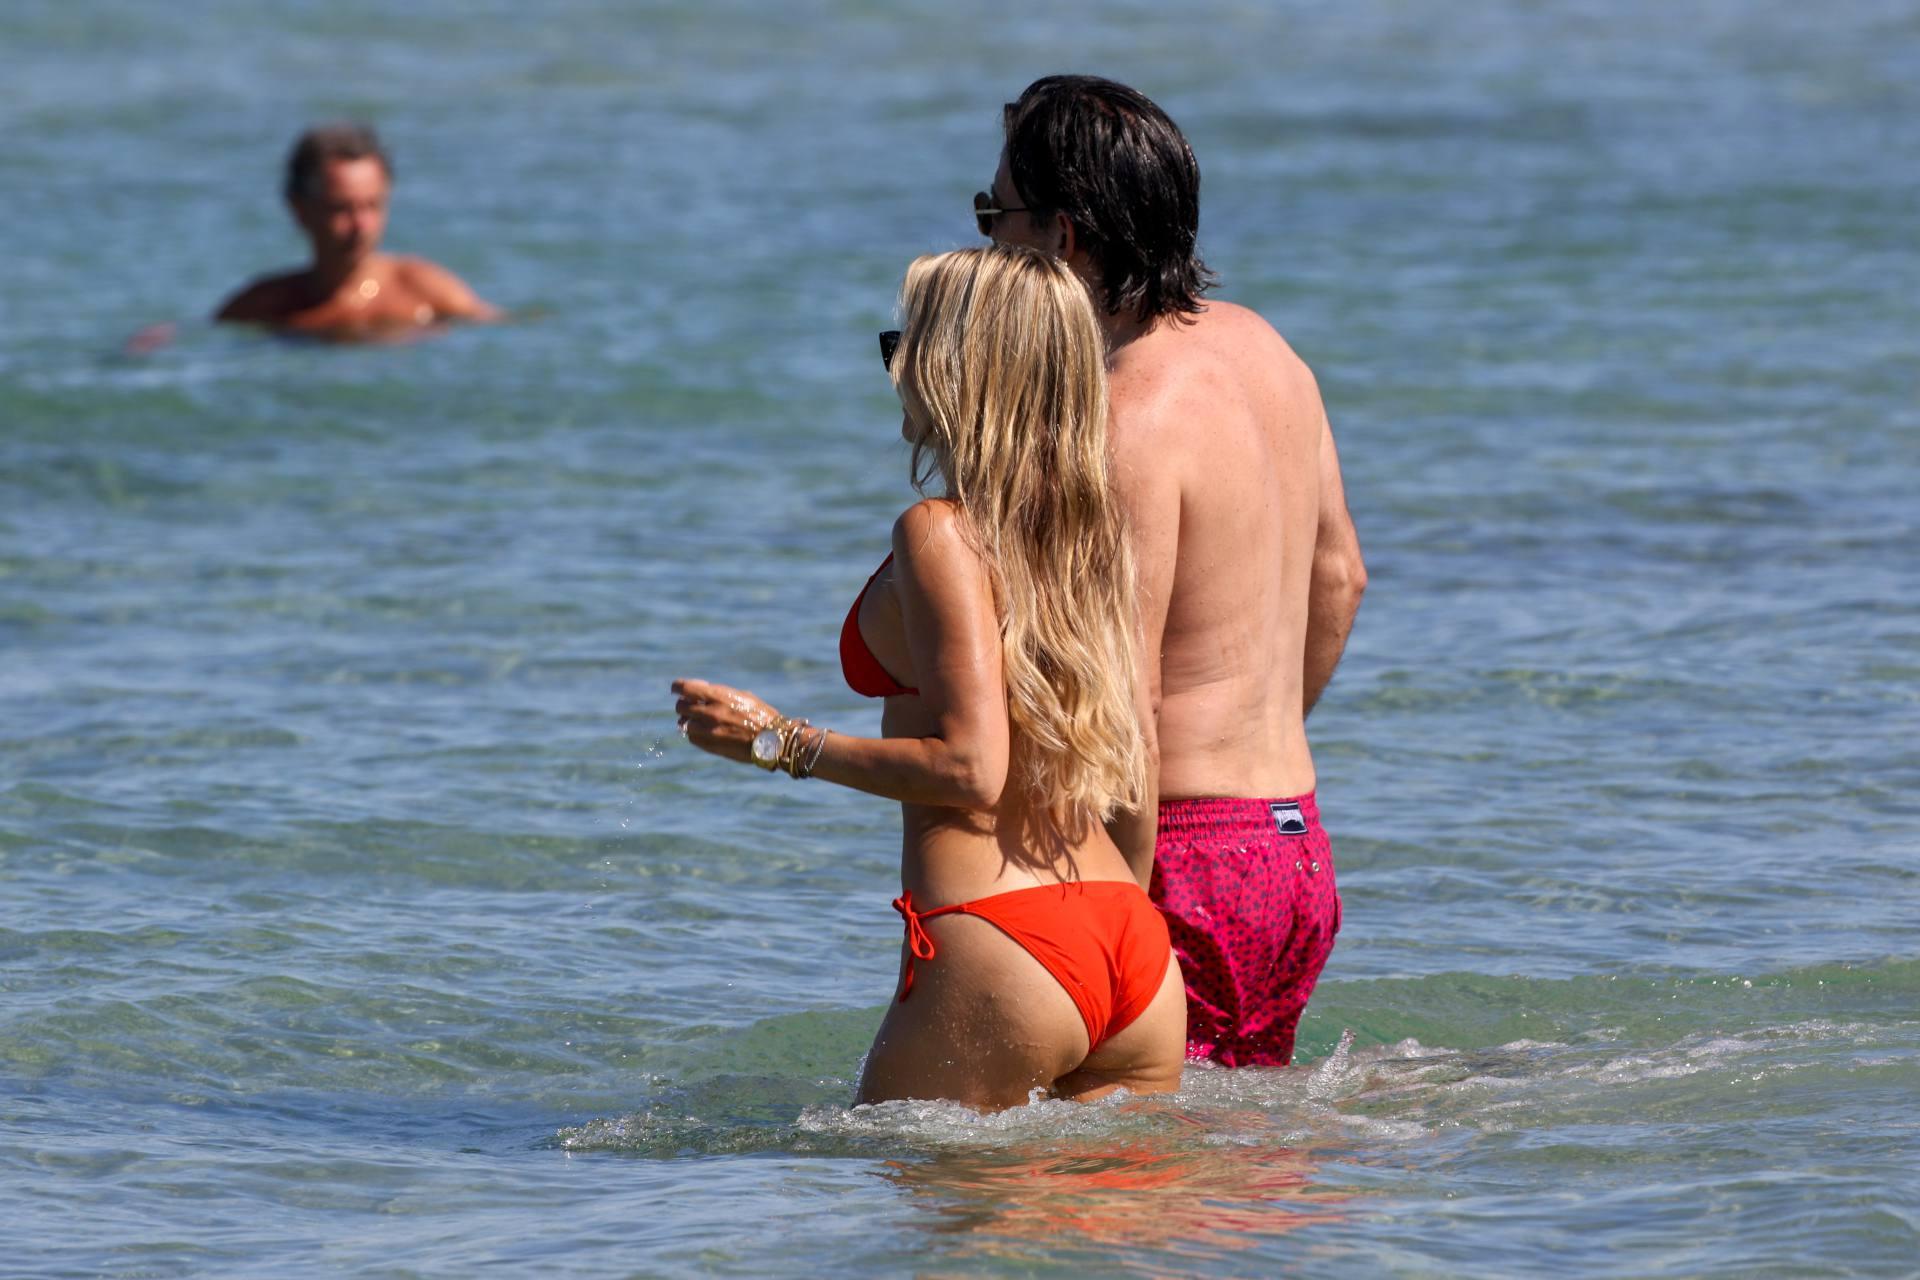 Sylvie Meis – Beautiful Body In Sexy Bikini On The Beach In Saint Tropez 0006